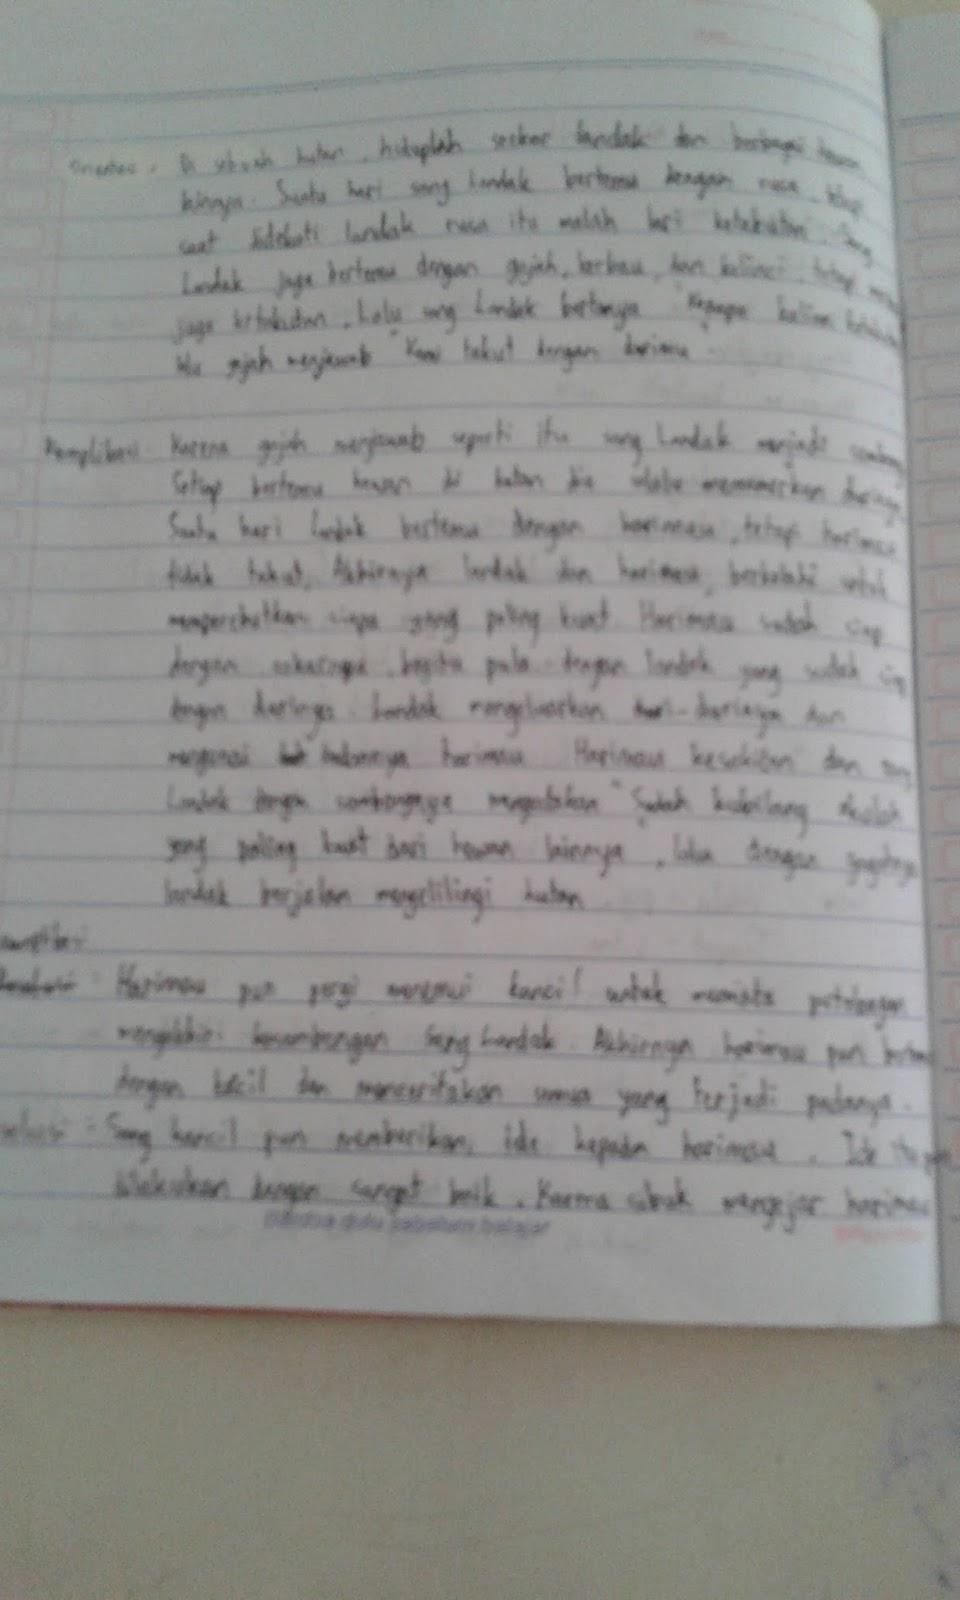 01 Achmad Fadhillah Kelas 8 4 Landak Yang Sombong Materi Dasar